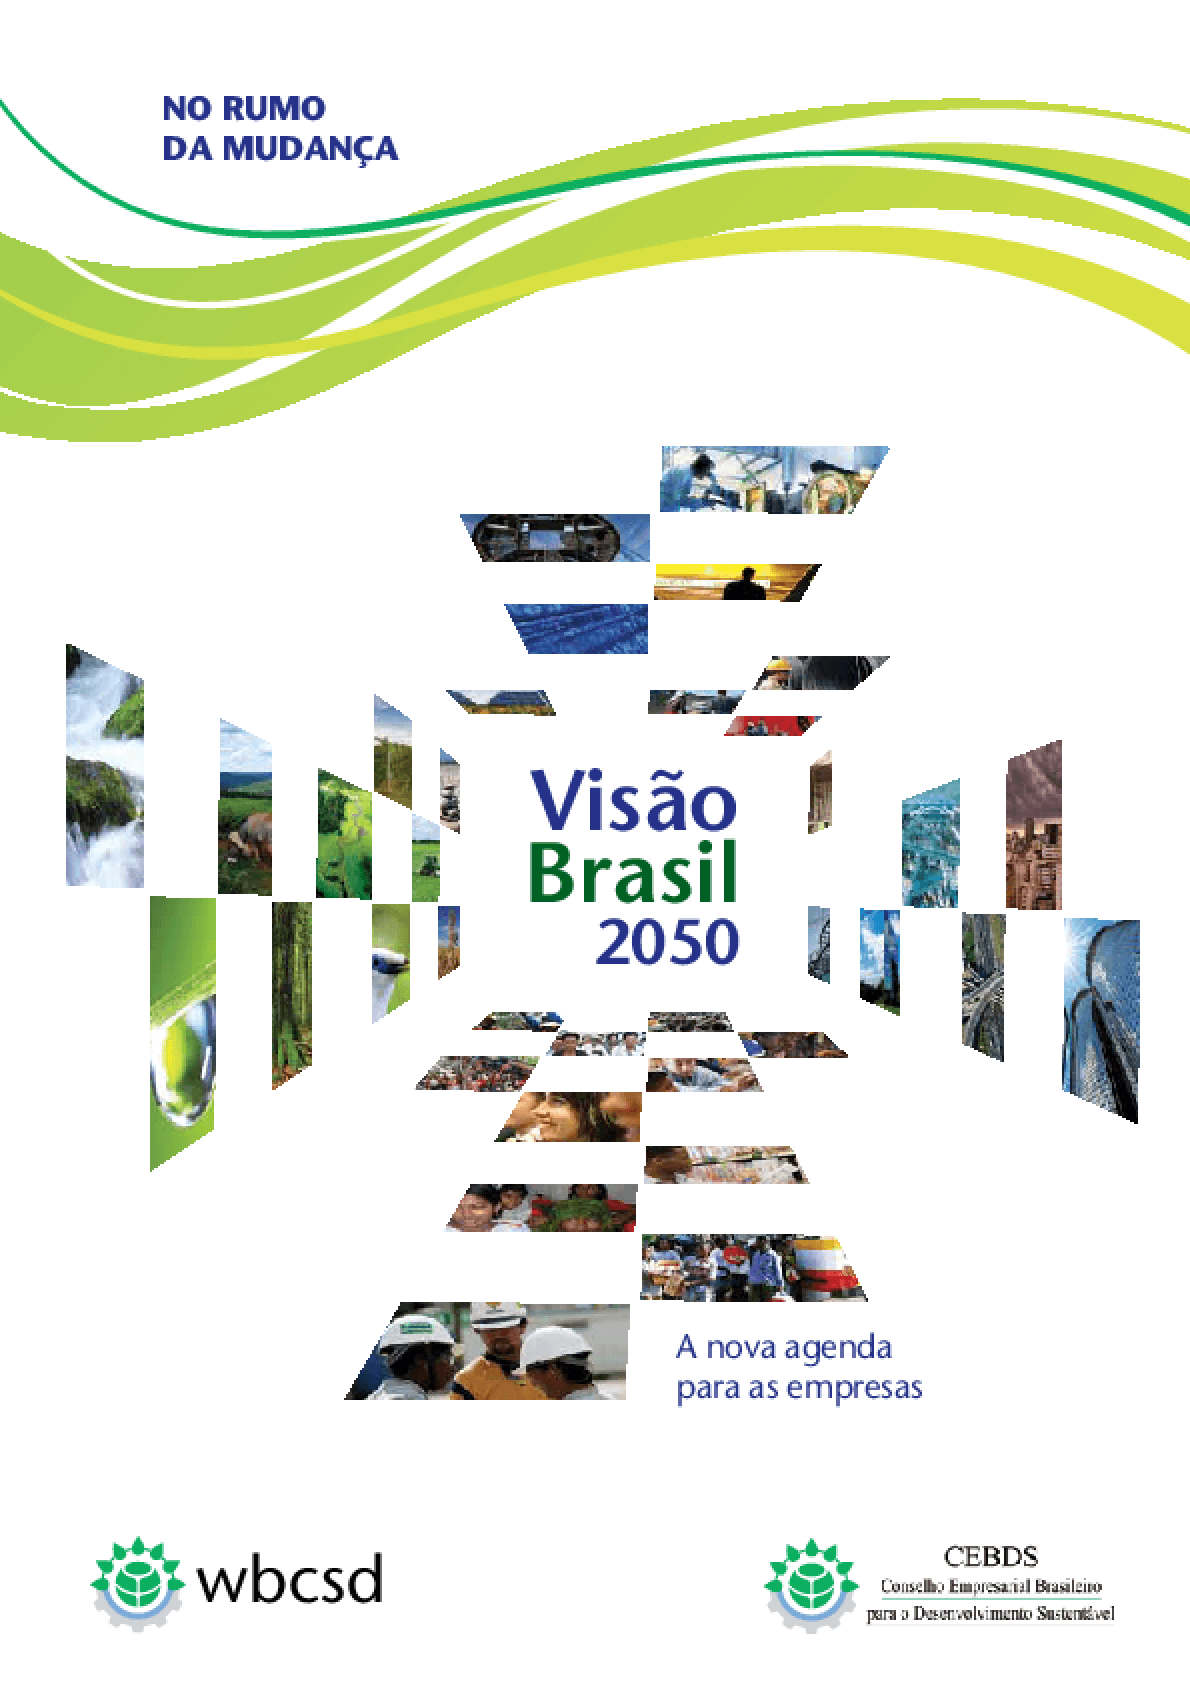 Visão Brasil 2050